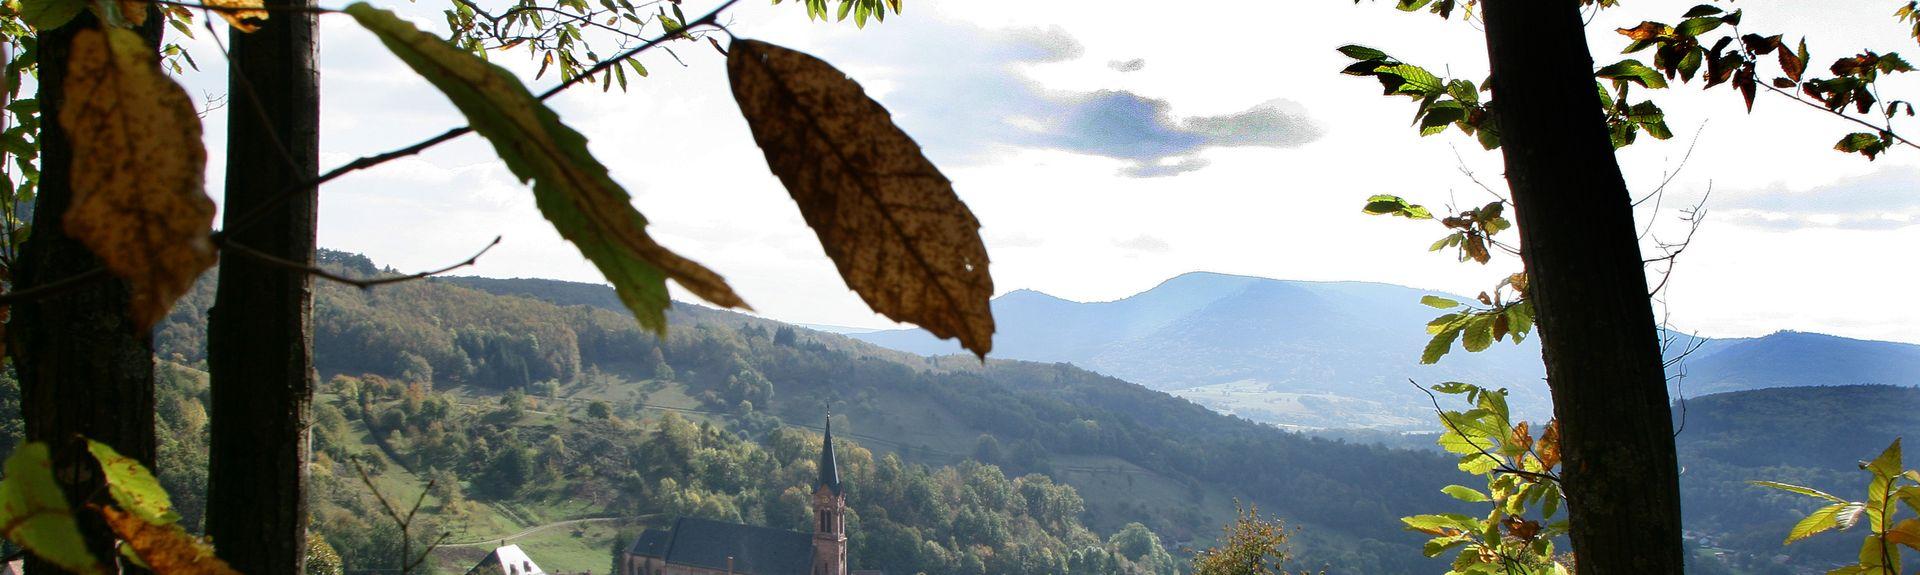 Andlau, Alsace-Champagne-Ardenne-Lorraine, France